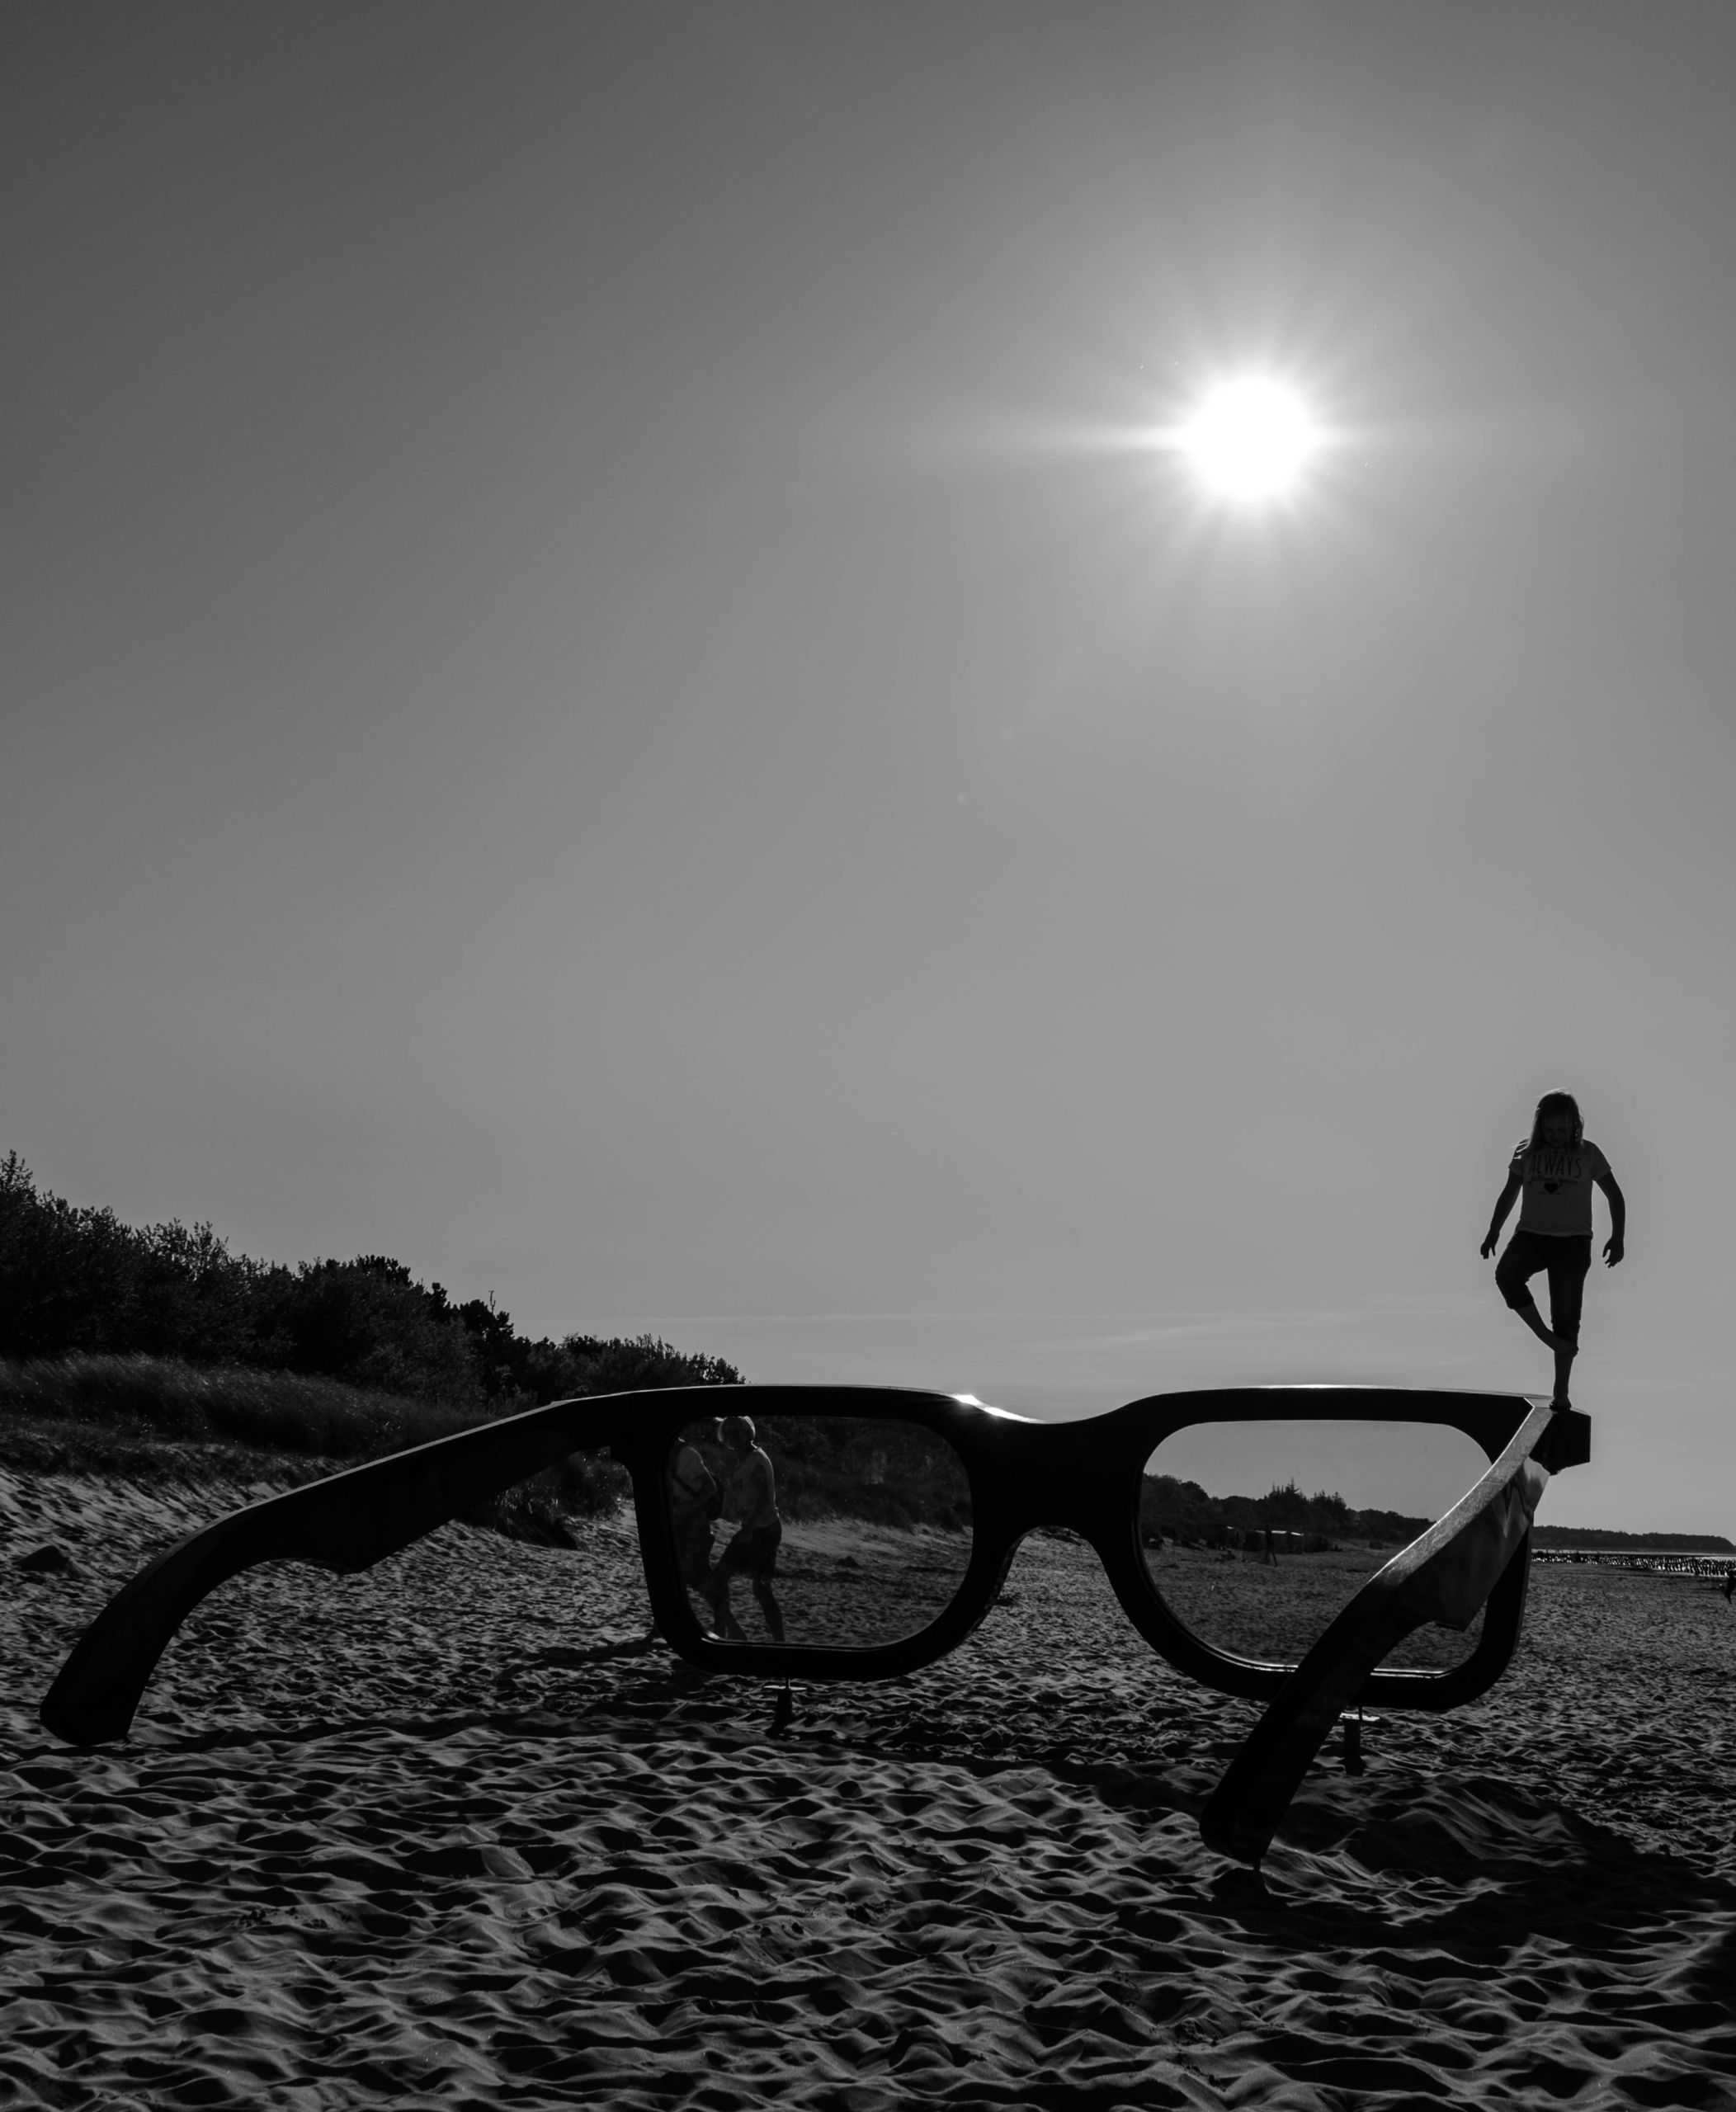 Balance Beach Zingst, Germany 2 - georgie_pauwels | ello